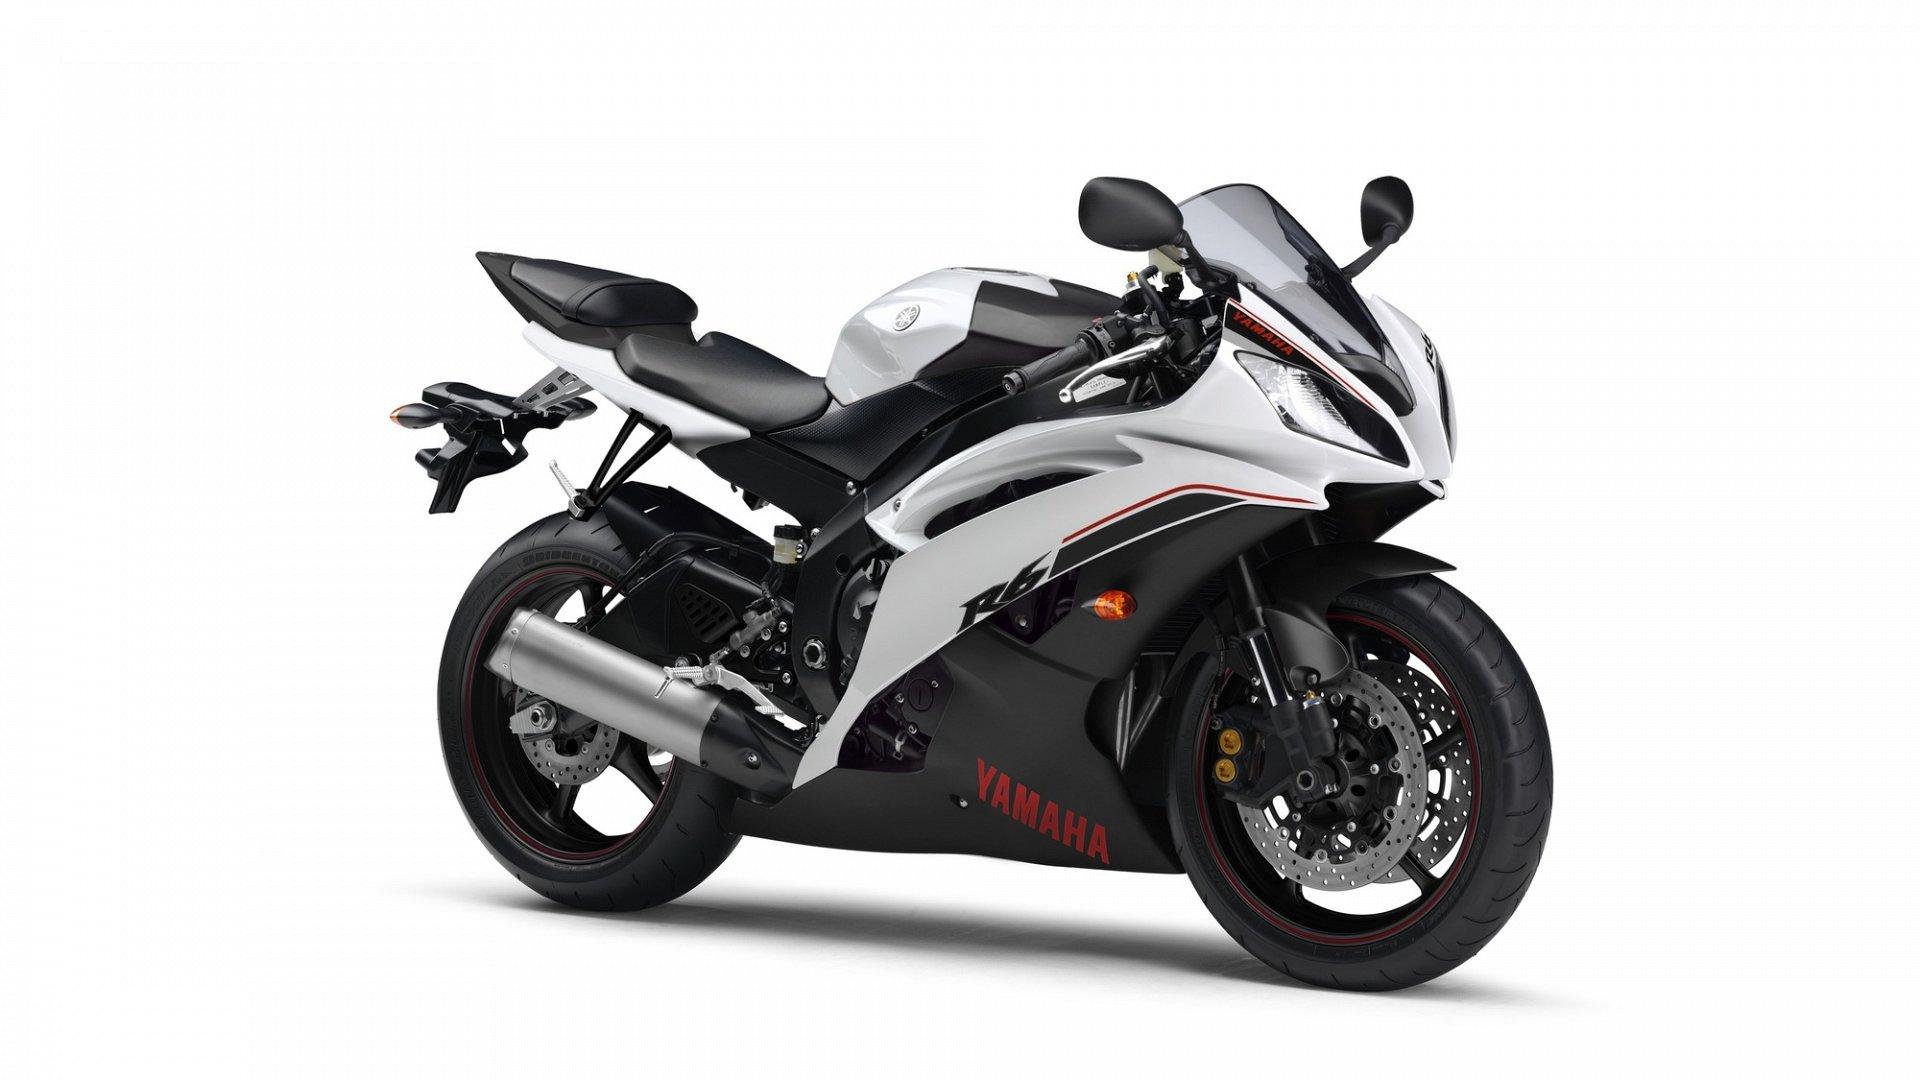 New Yamaha R6 2014 Price